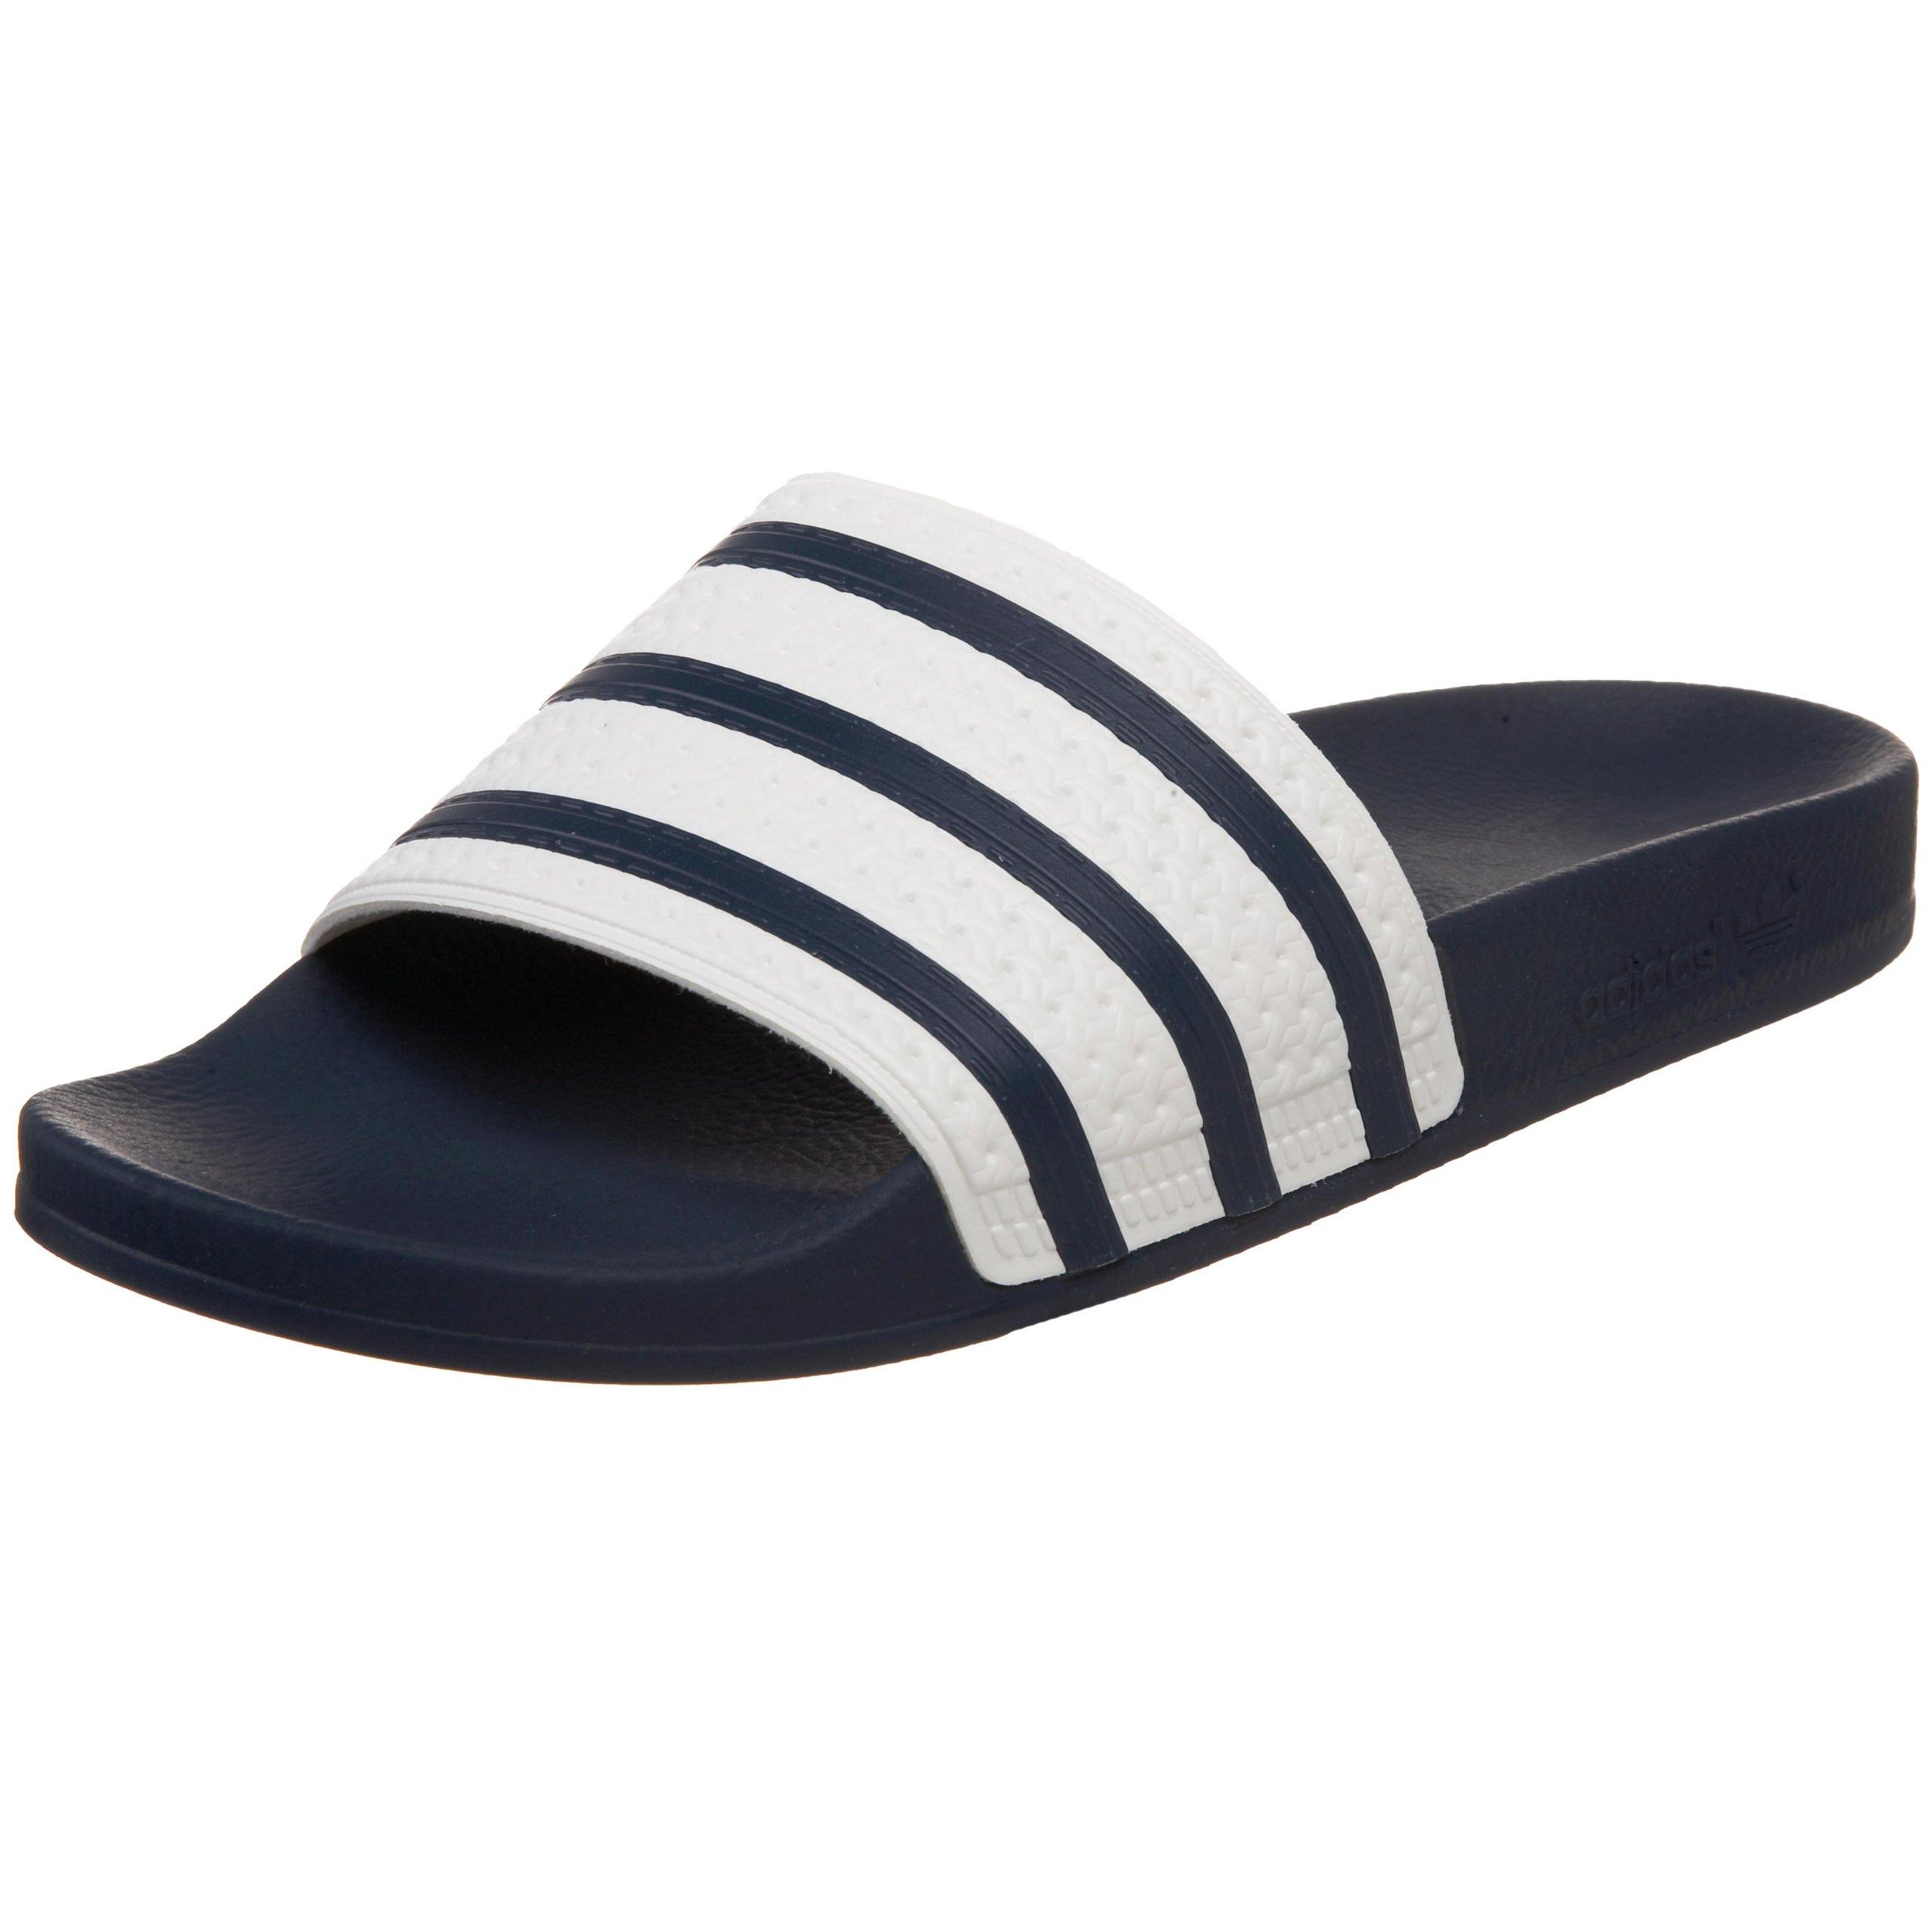 95bd1cd1d0887 Galleon - Adidas Men s ADILETTE Sandal